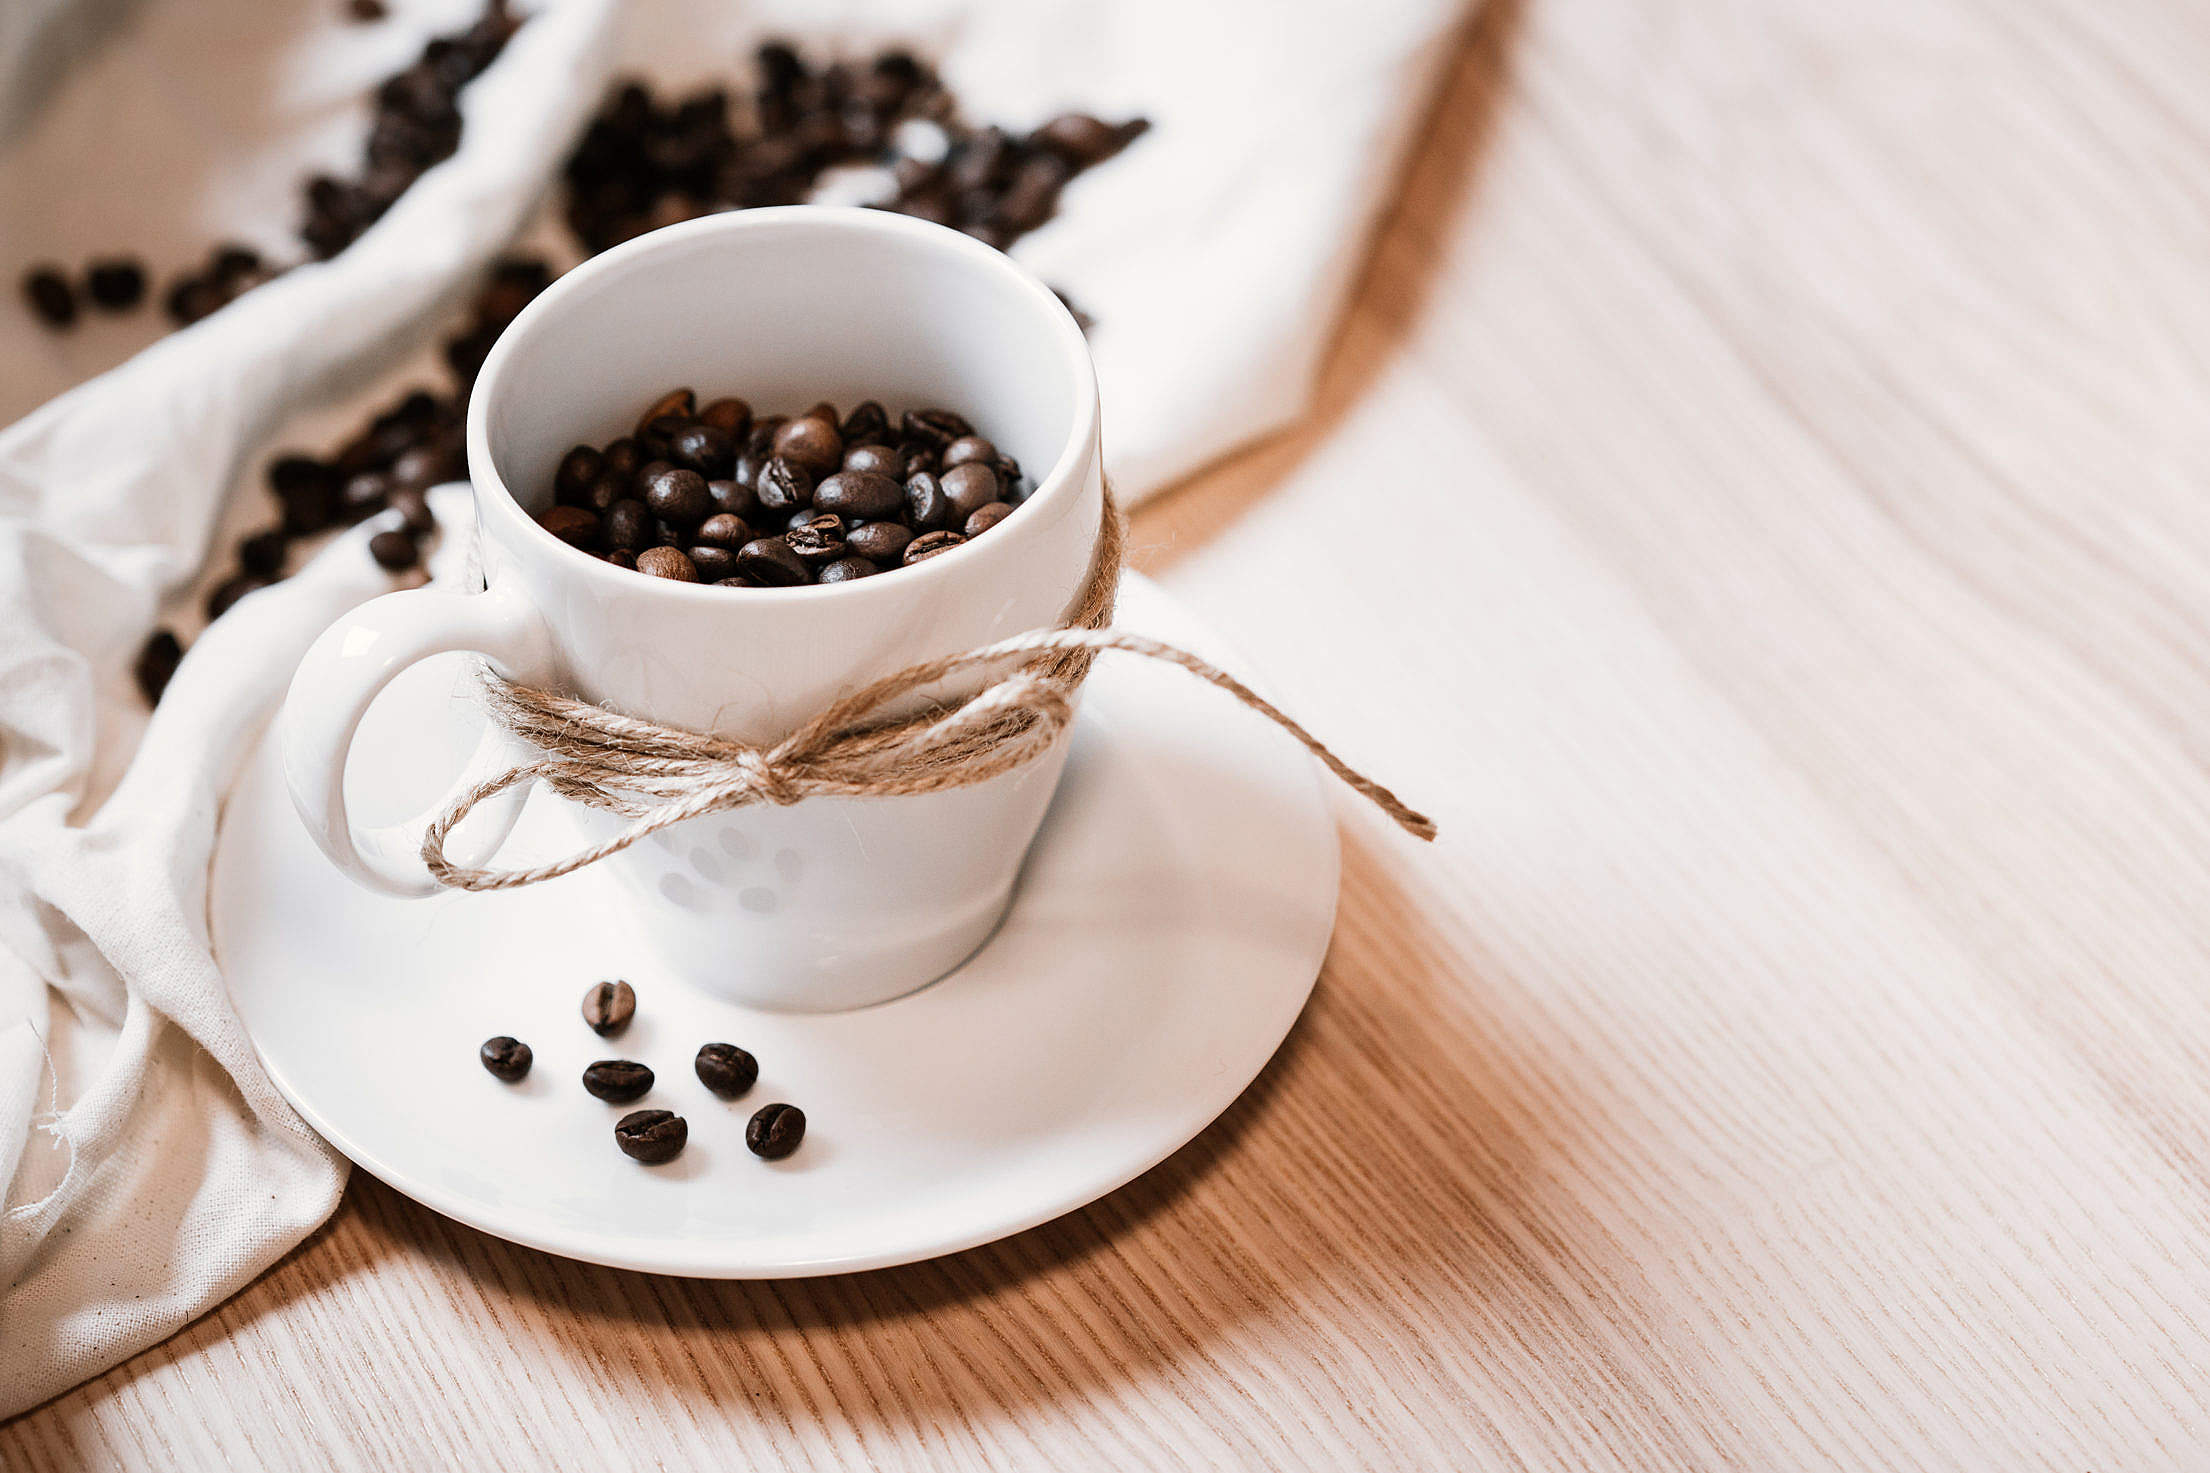 Coffee Beans in a Mug Free Stock Photo